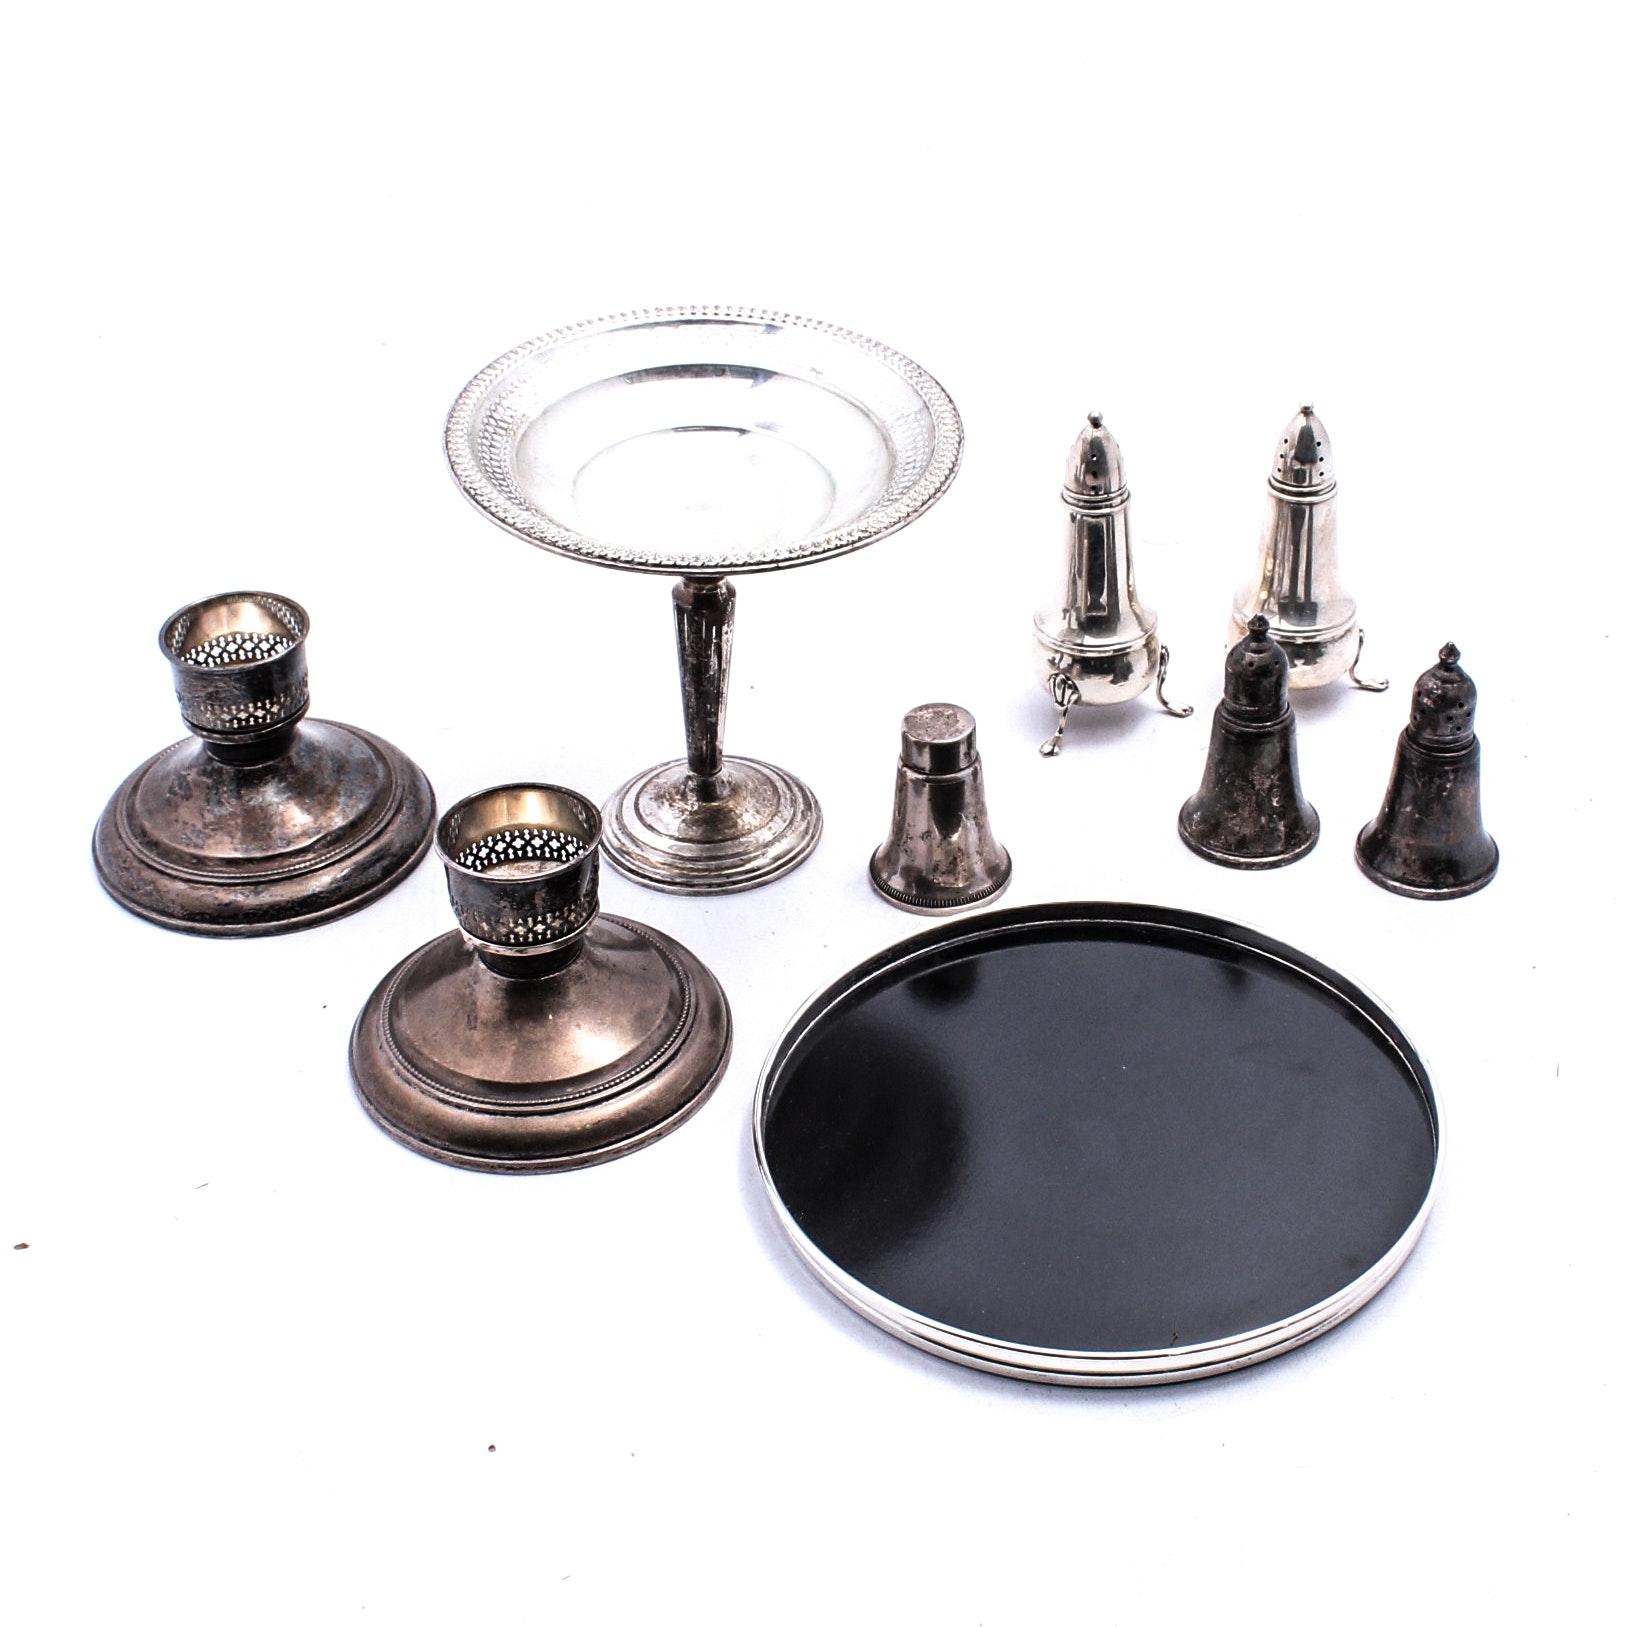 Weighted Sterling Silver Serveware Featuring Gorham, Wallace, Crown, Duchin